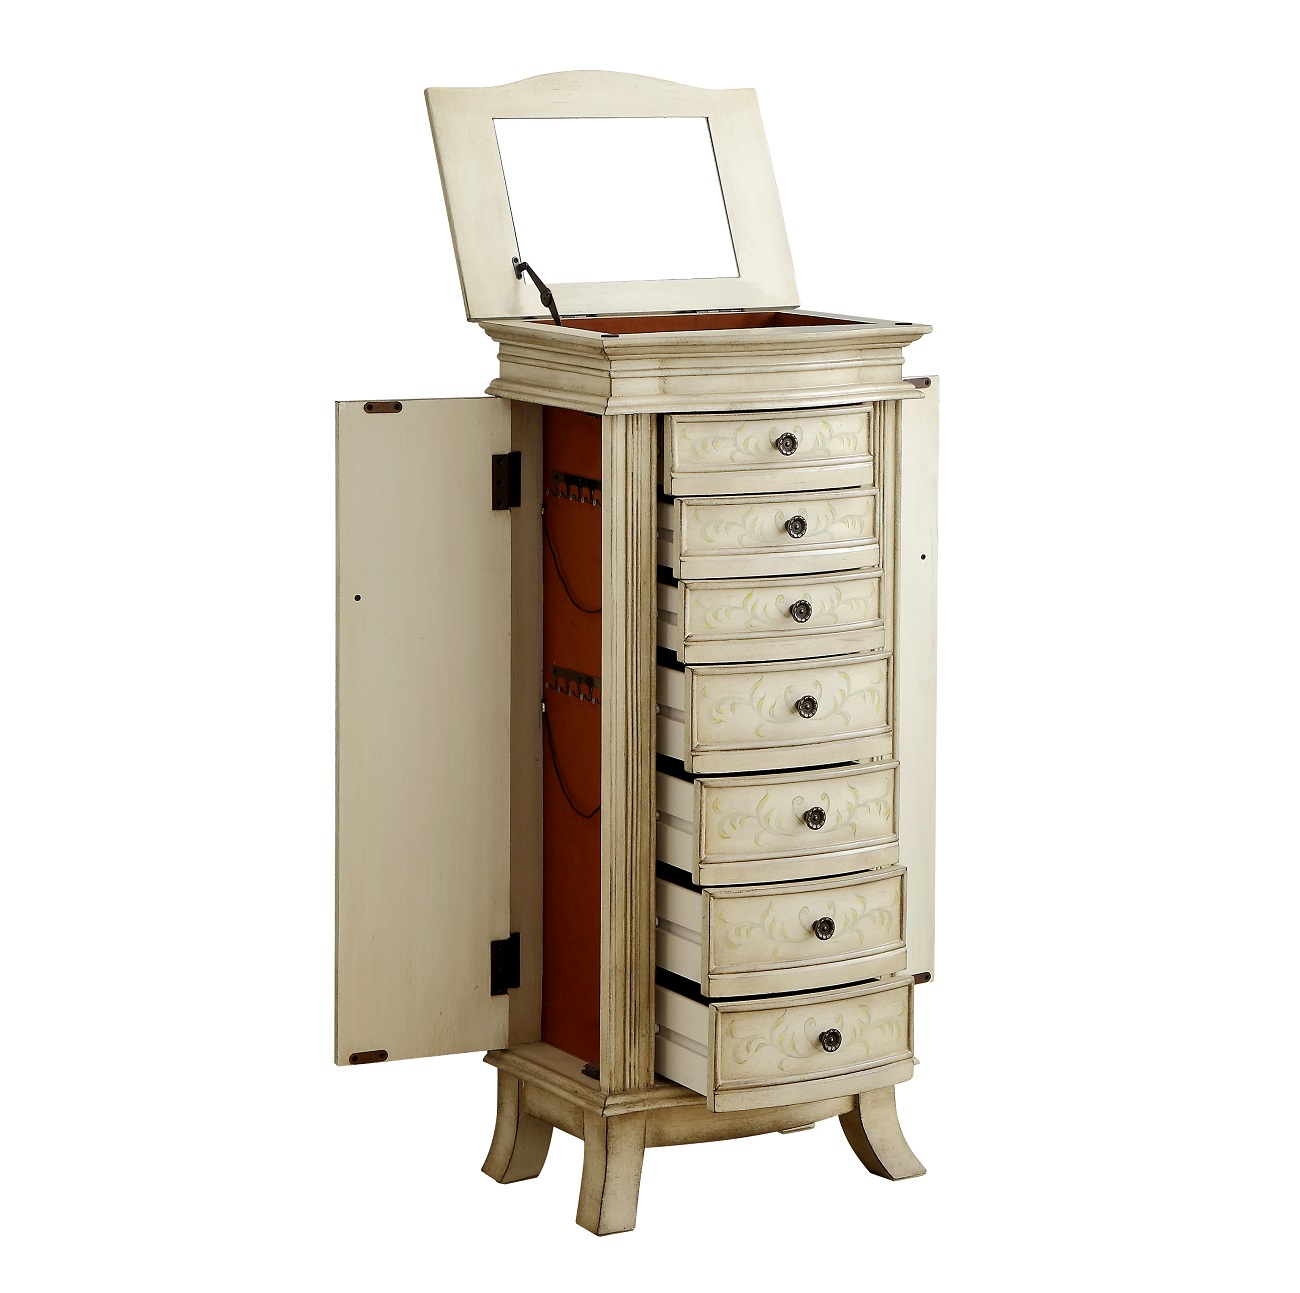 seven drawers plus side doors